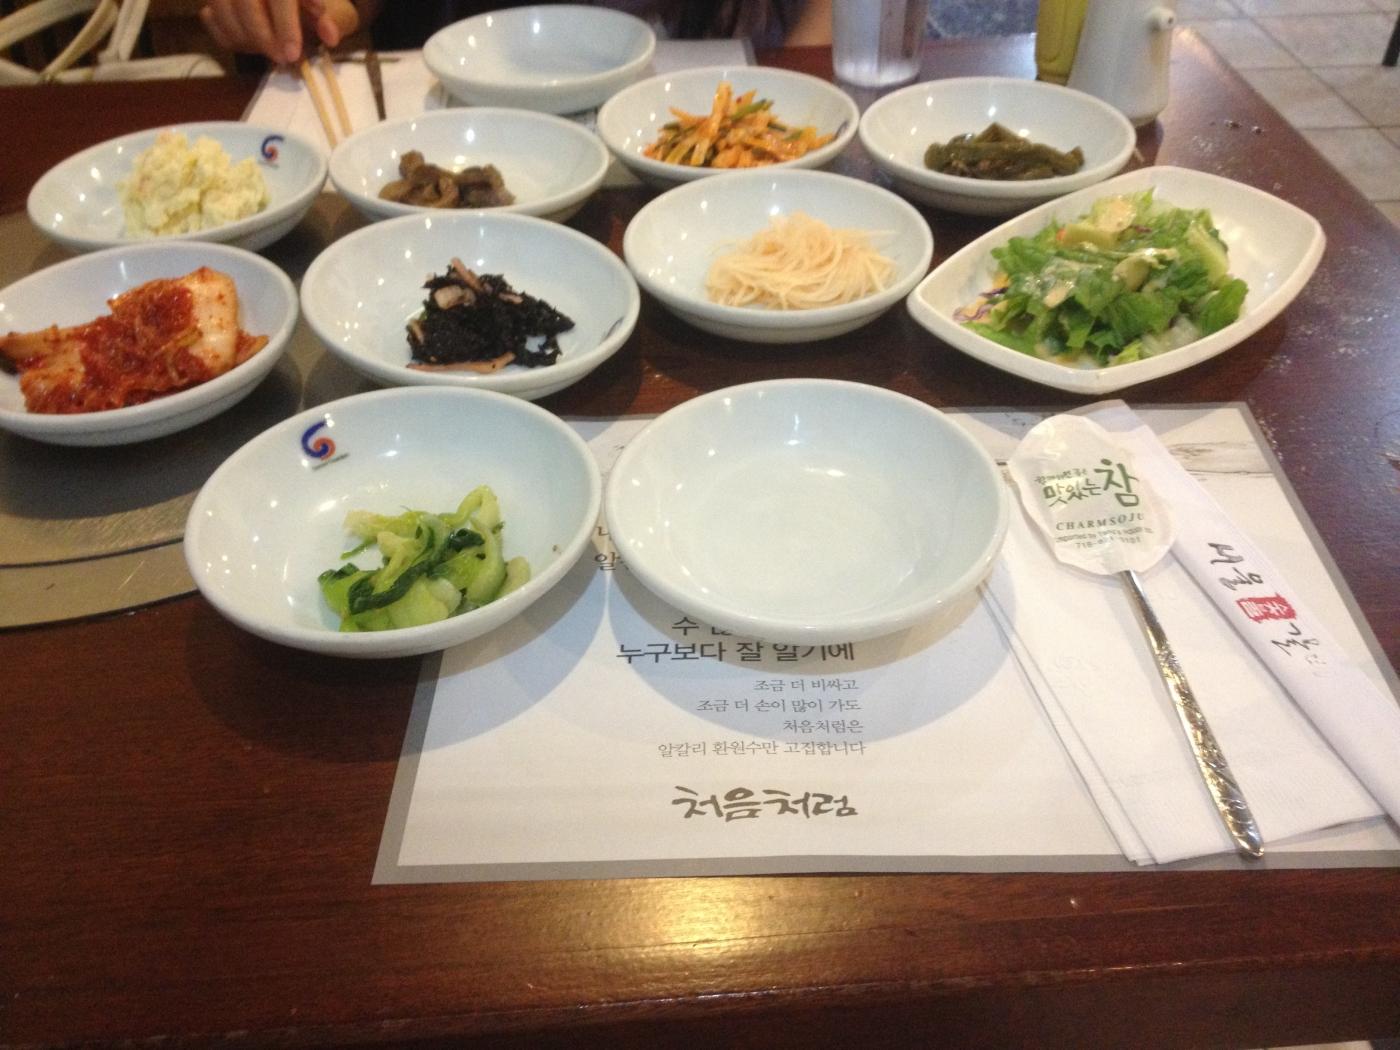 [jiejoy]星期日晚餐---首尔韩式餐_图1-3